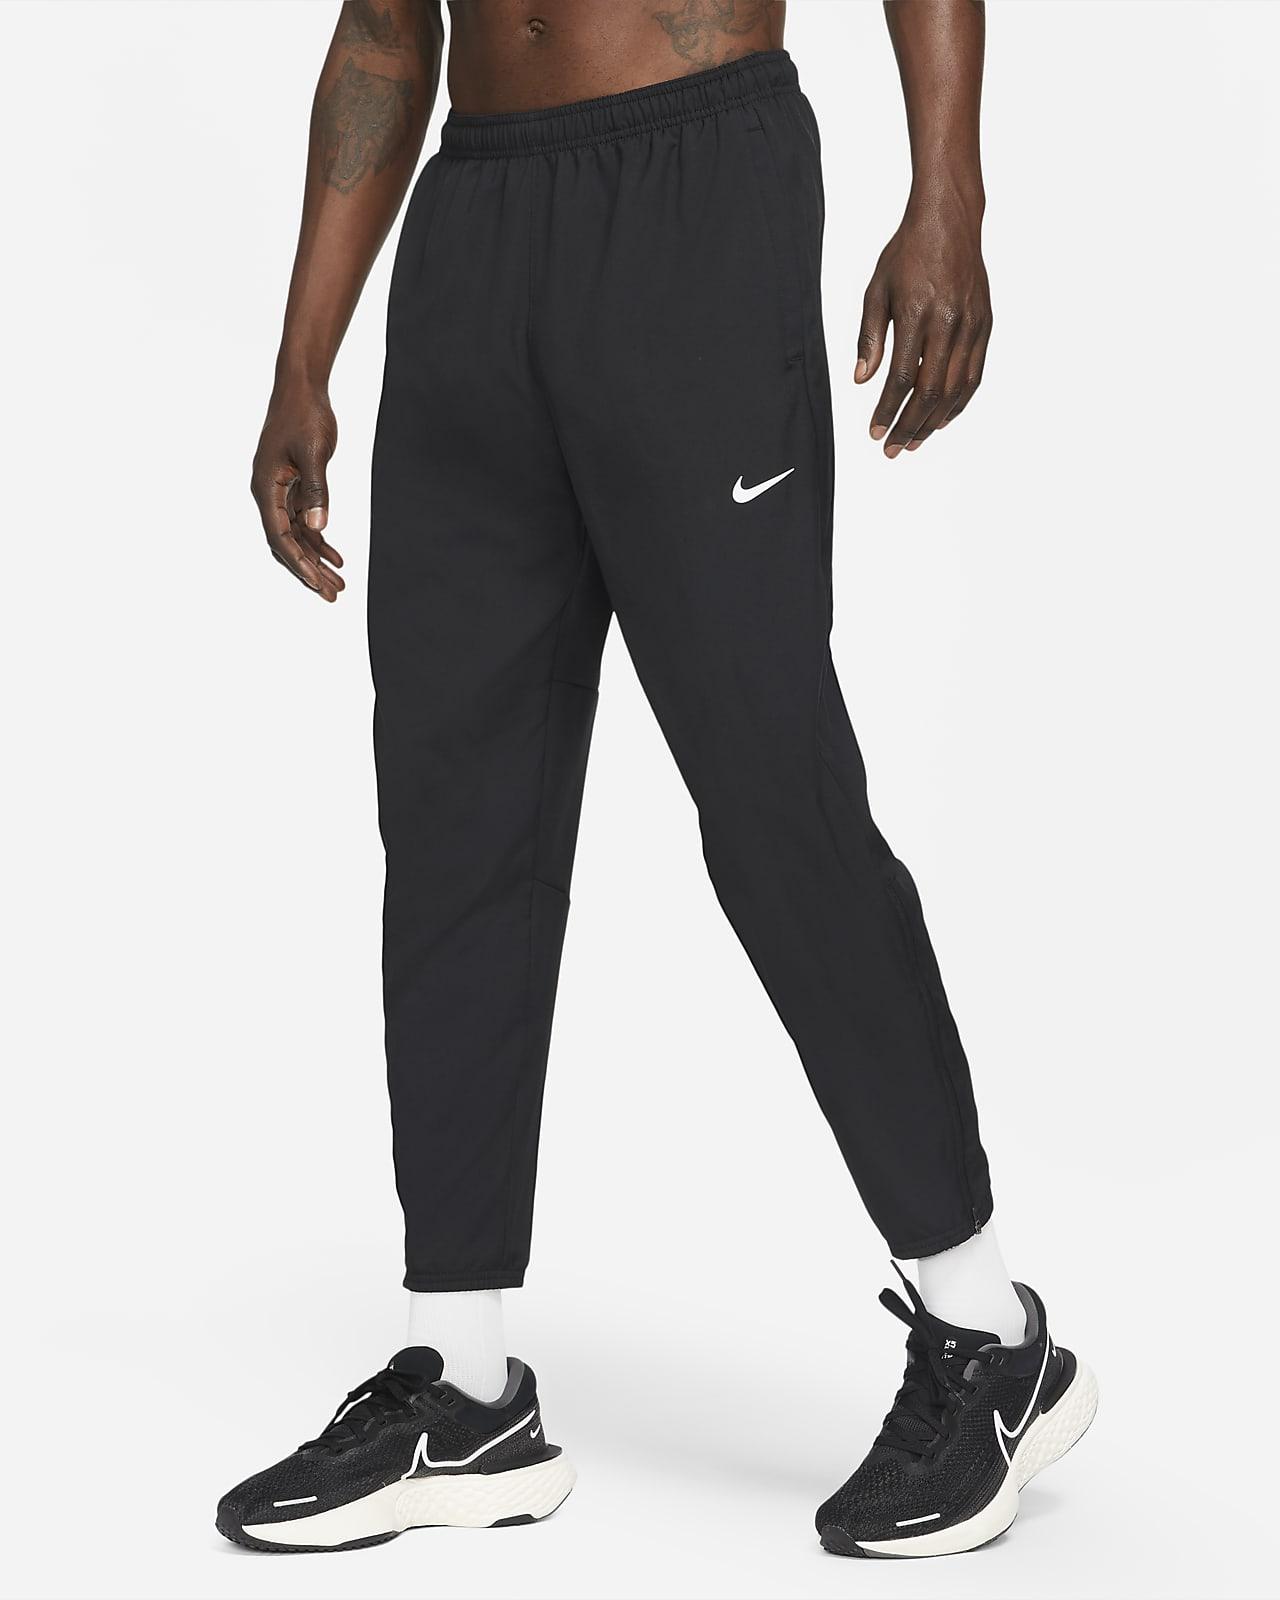 Nike Dri-FIT Challenger Herren-Laufhose aus Webmaterial